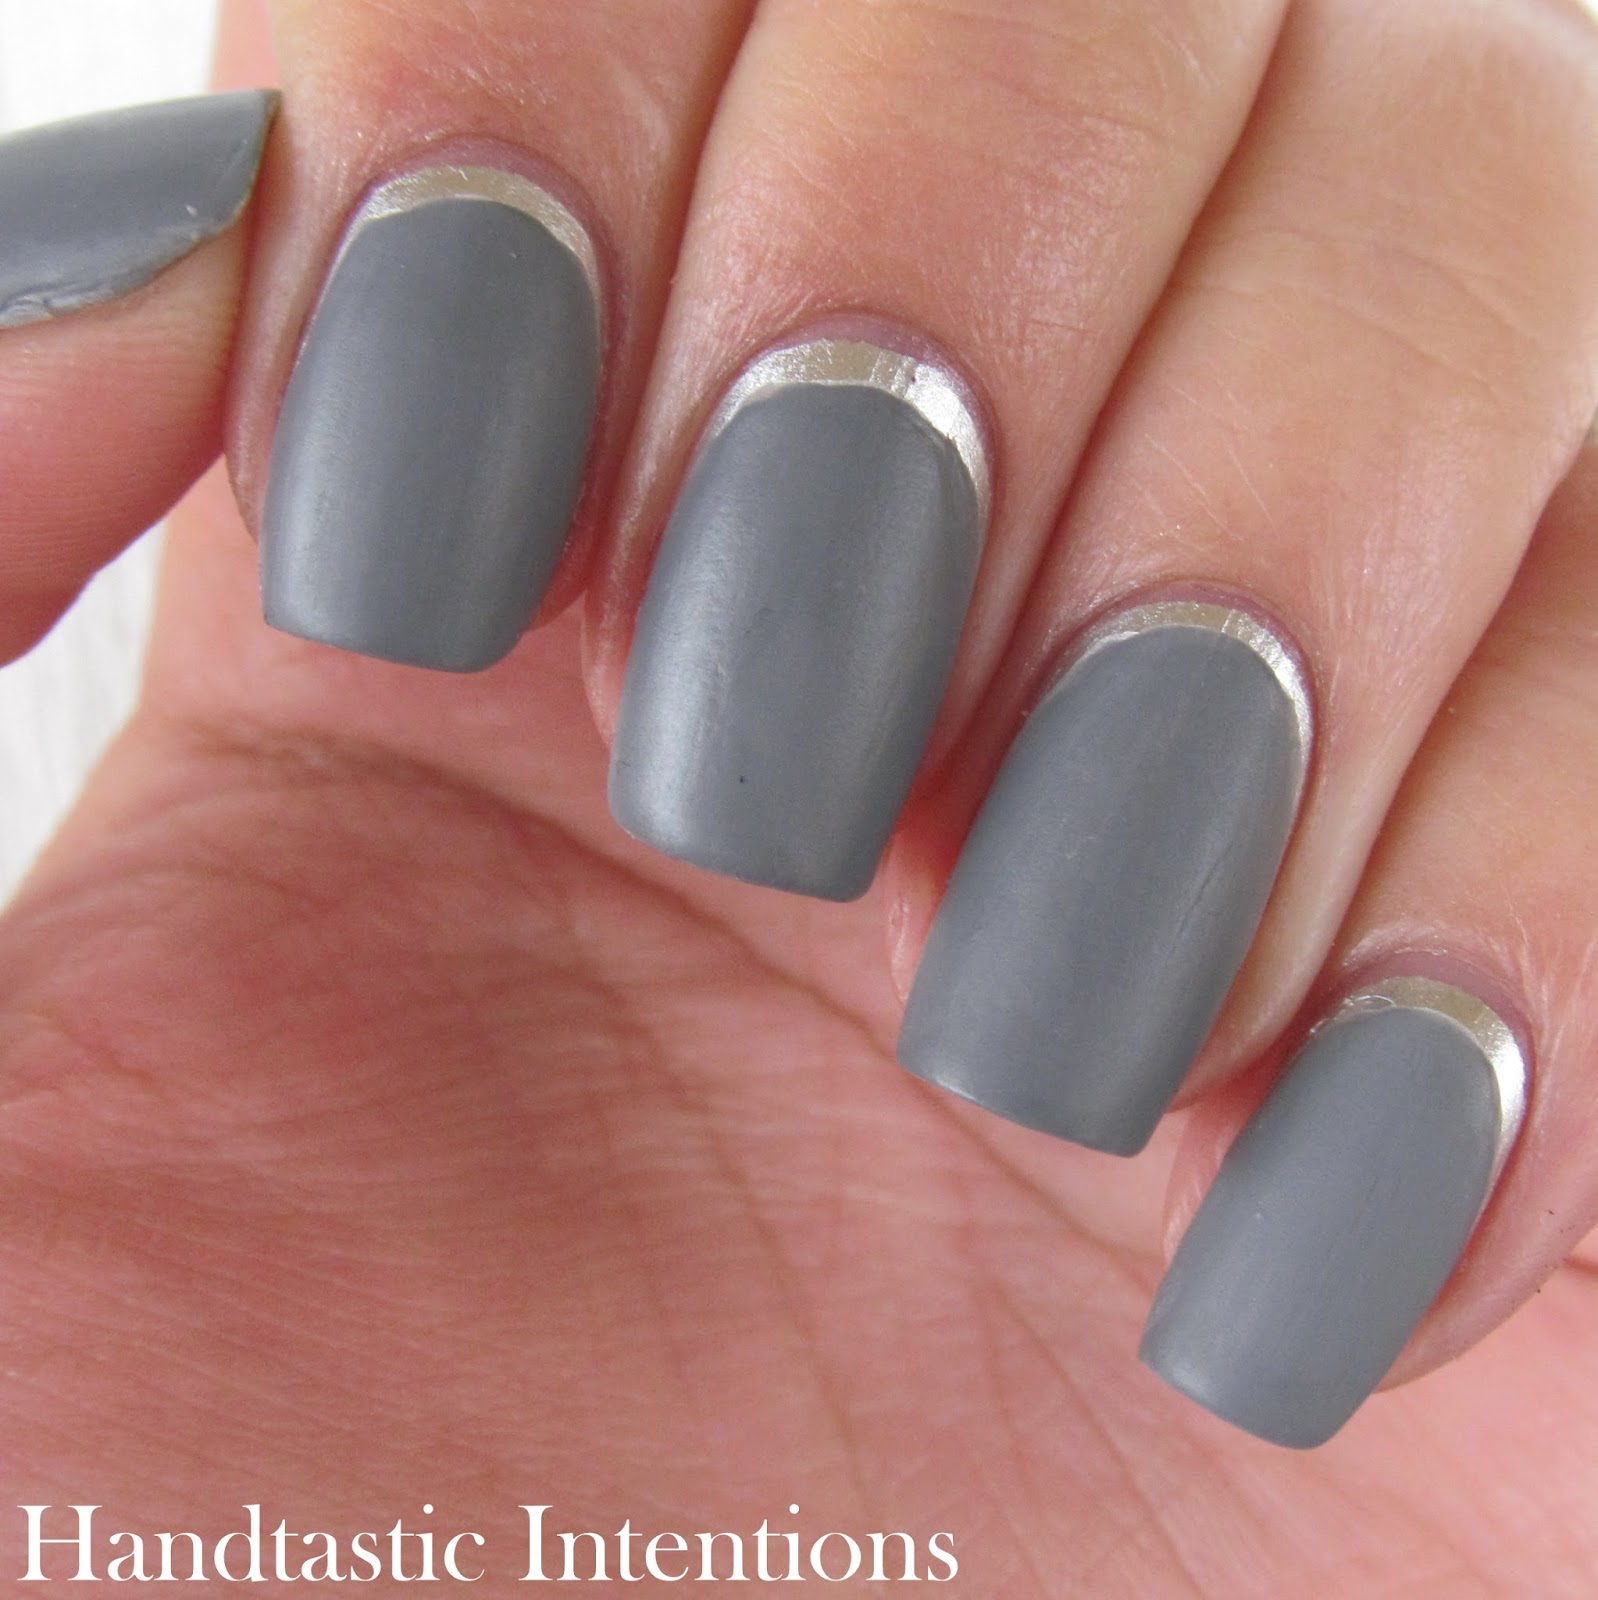 handtastic intentions: work wear wednesday tutorial subtle ruffian